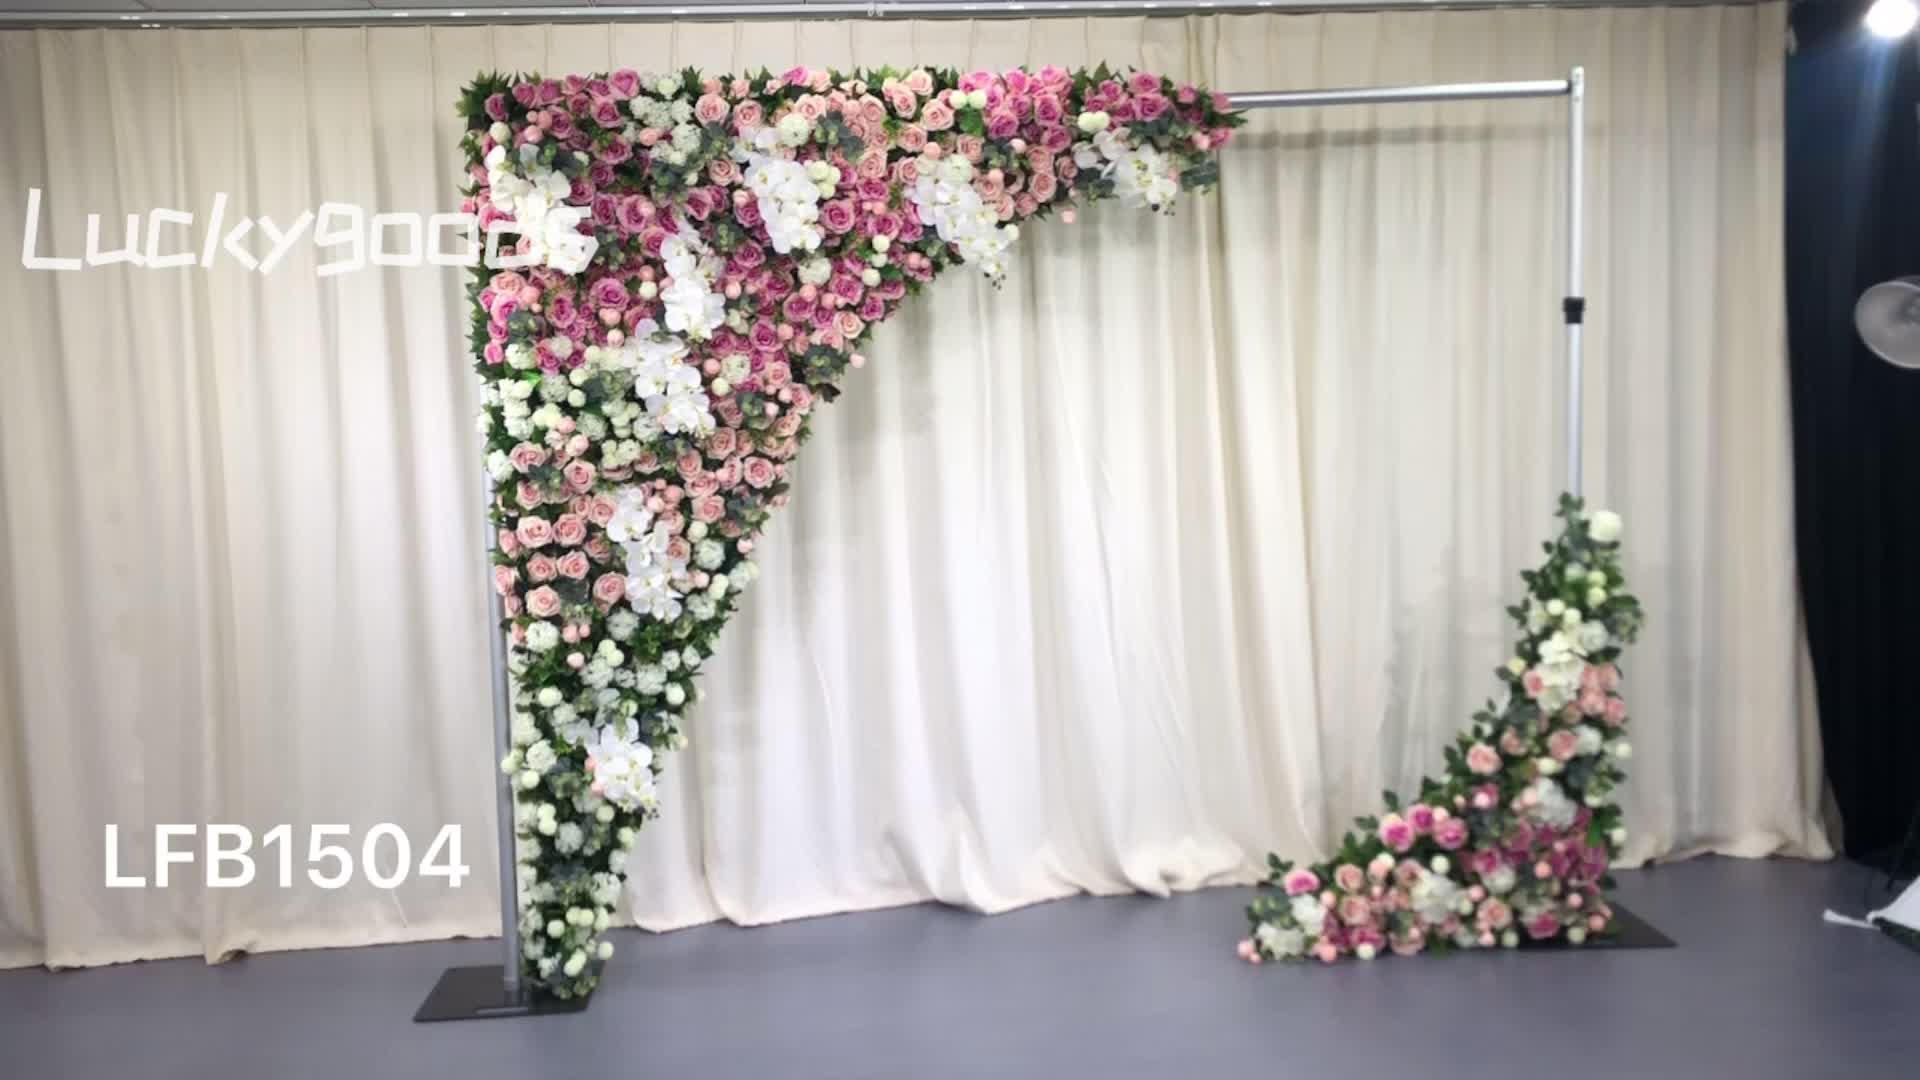 LFB1504 custom made artificial wedding triangle rose backdrop flower arrangement